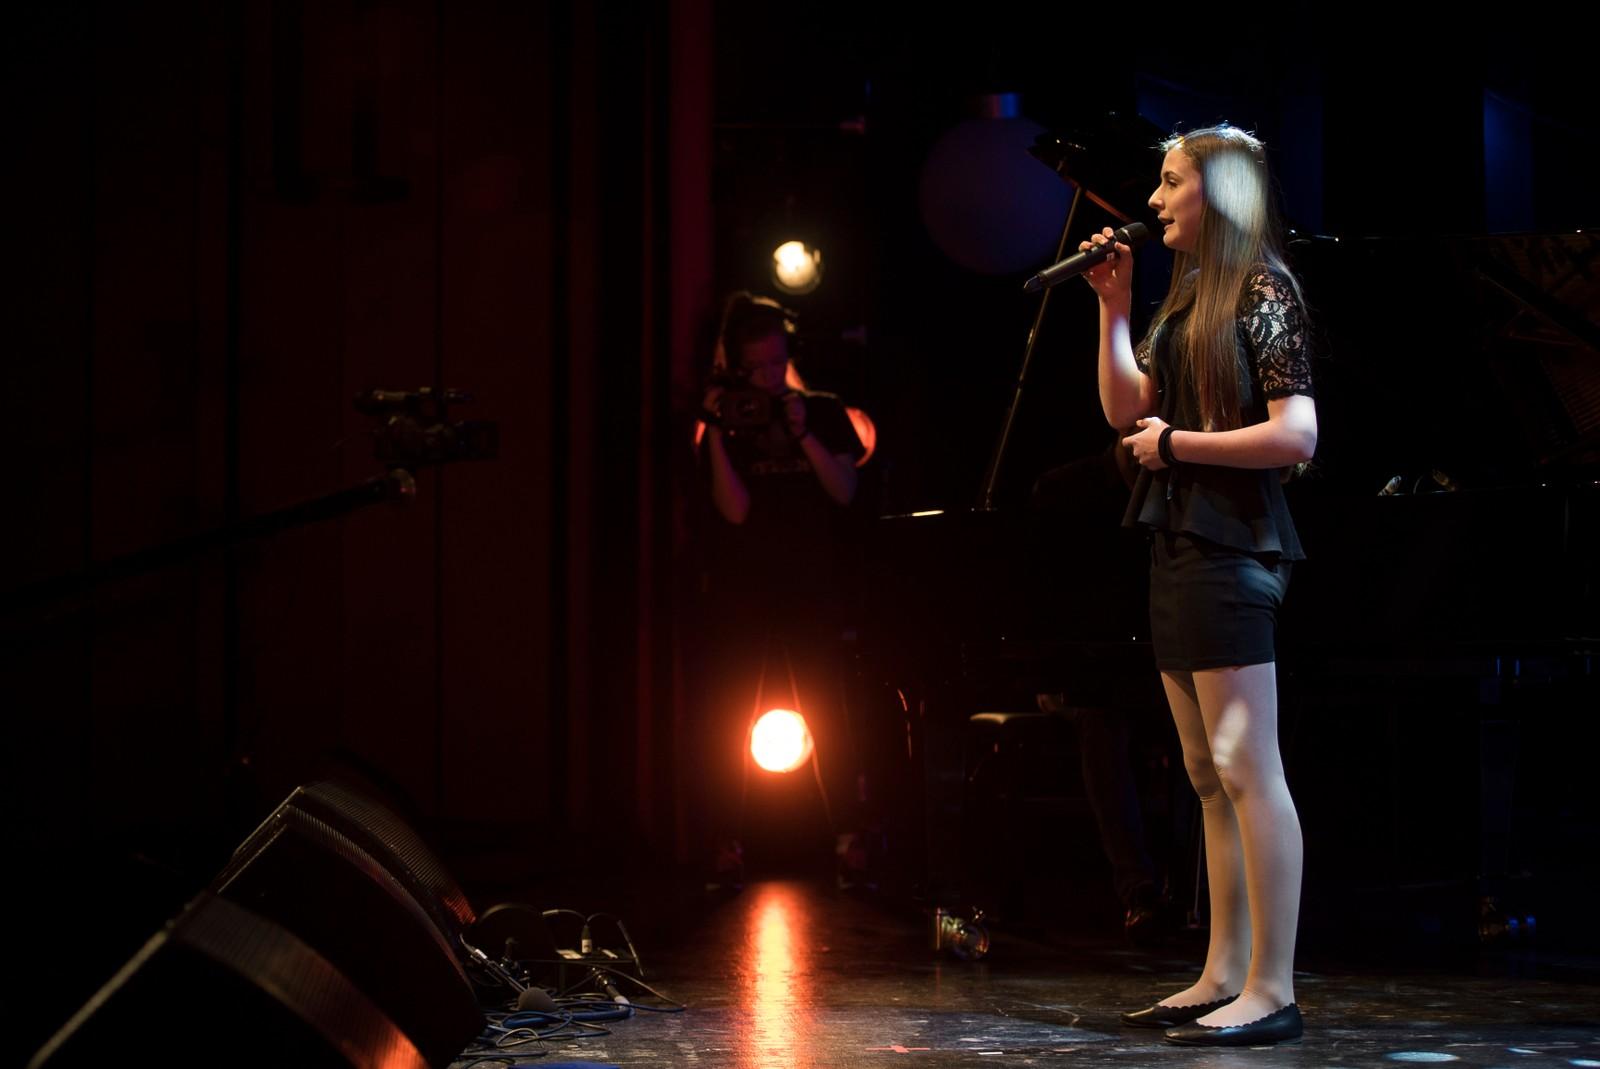 GLOPPEN: Mariann Endal Husevåg - When I look at you